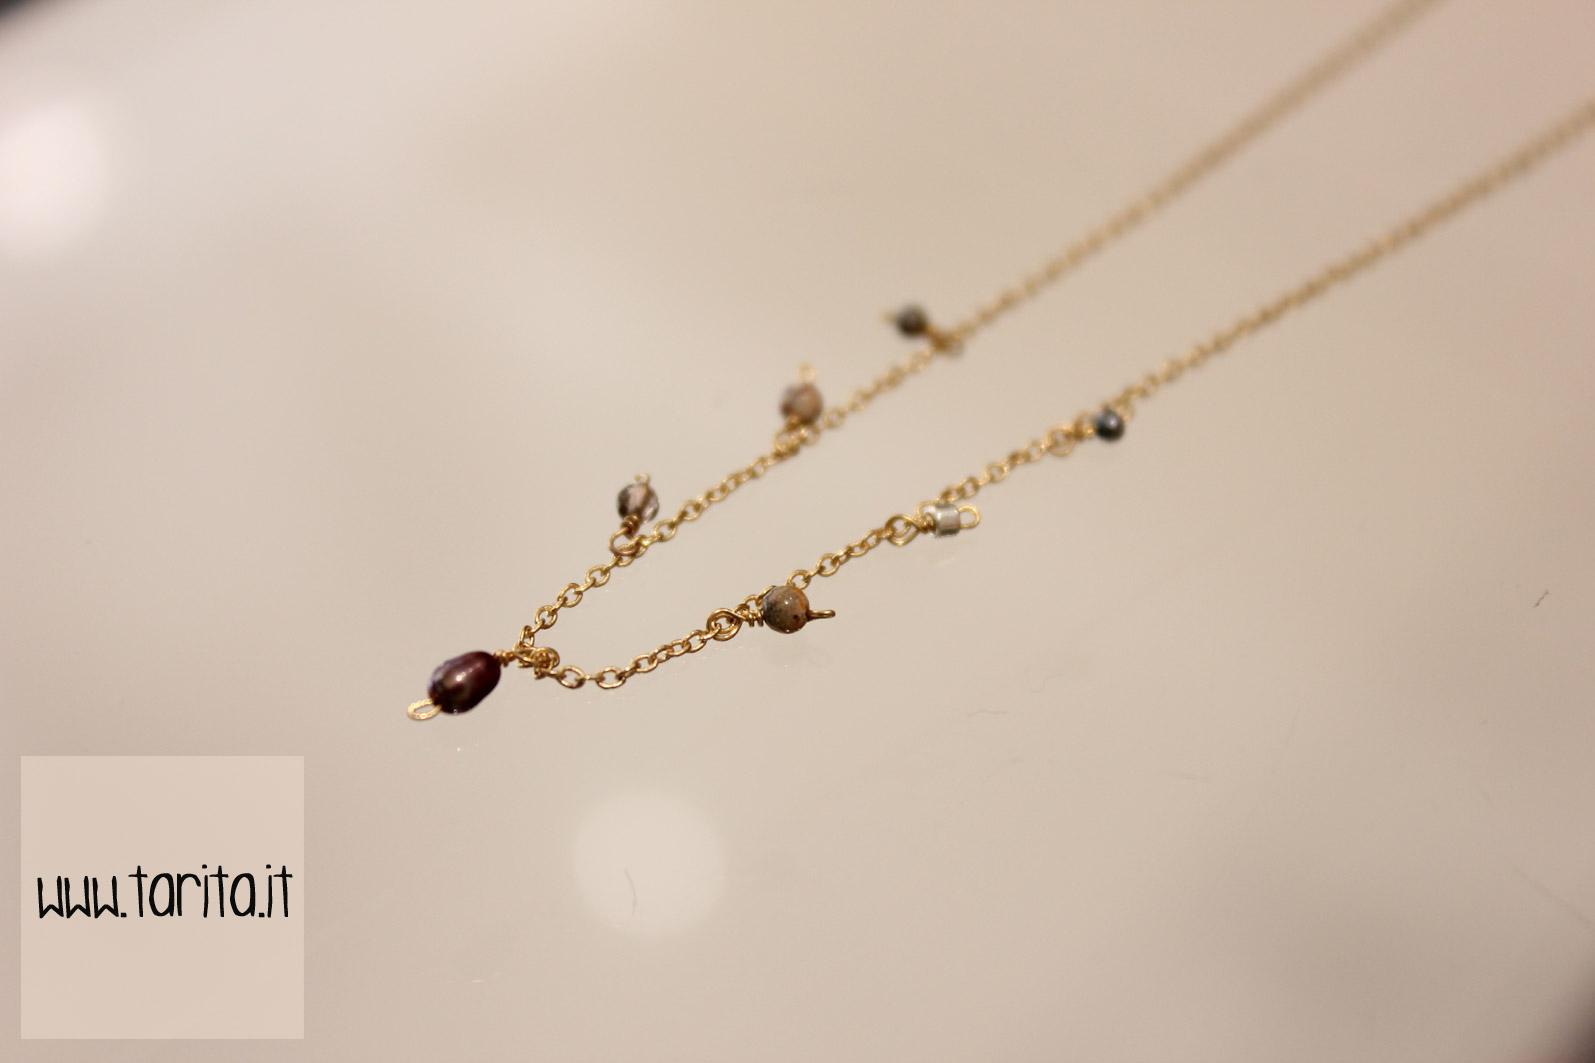 tarita 5 octobre bijoux precieux made in france. Black Bedroom Furniture Sets. Home Design Ideas